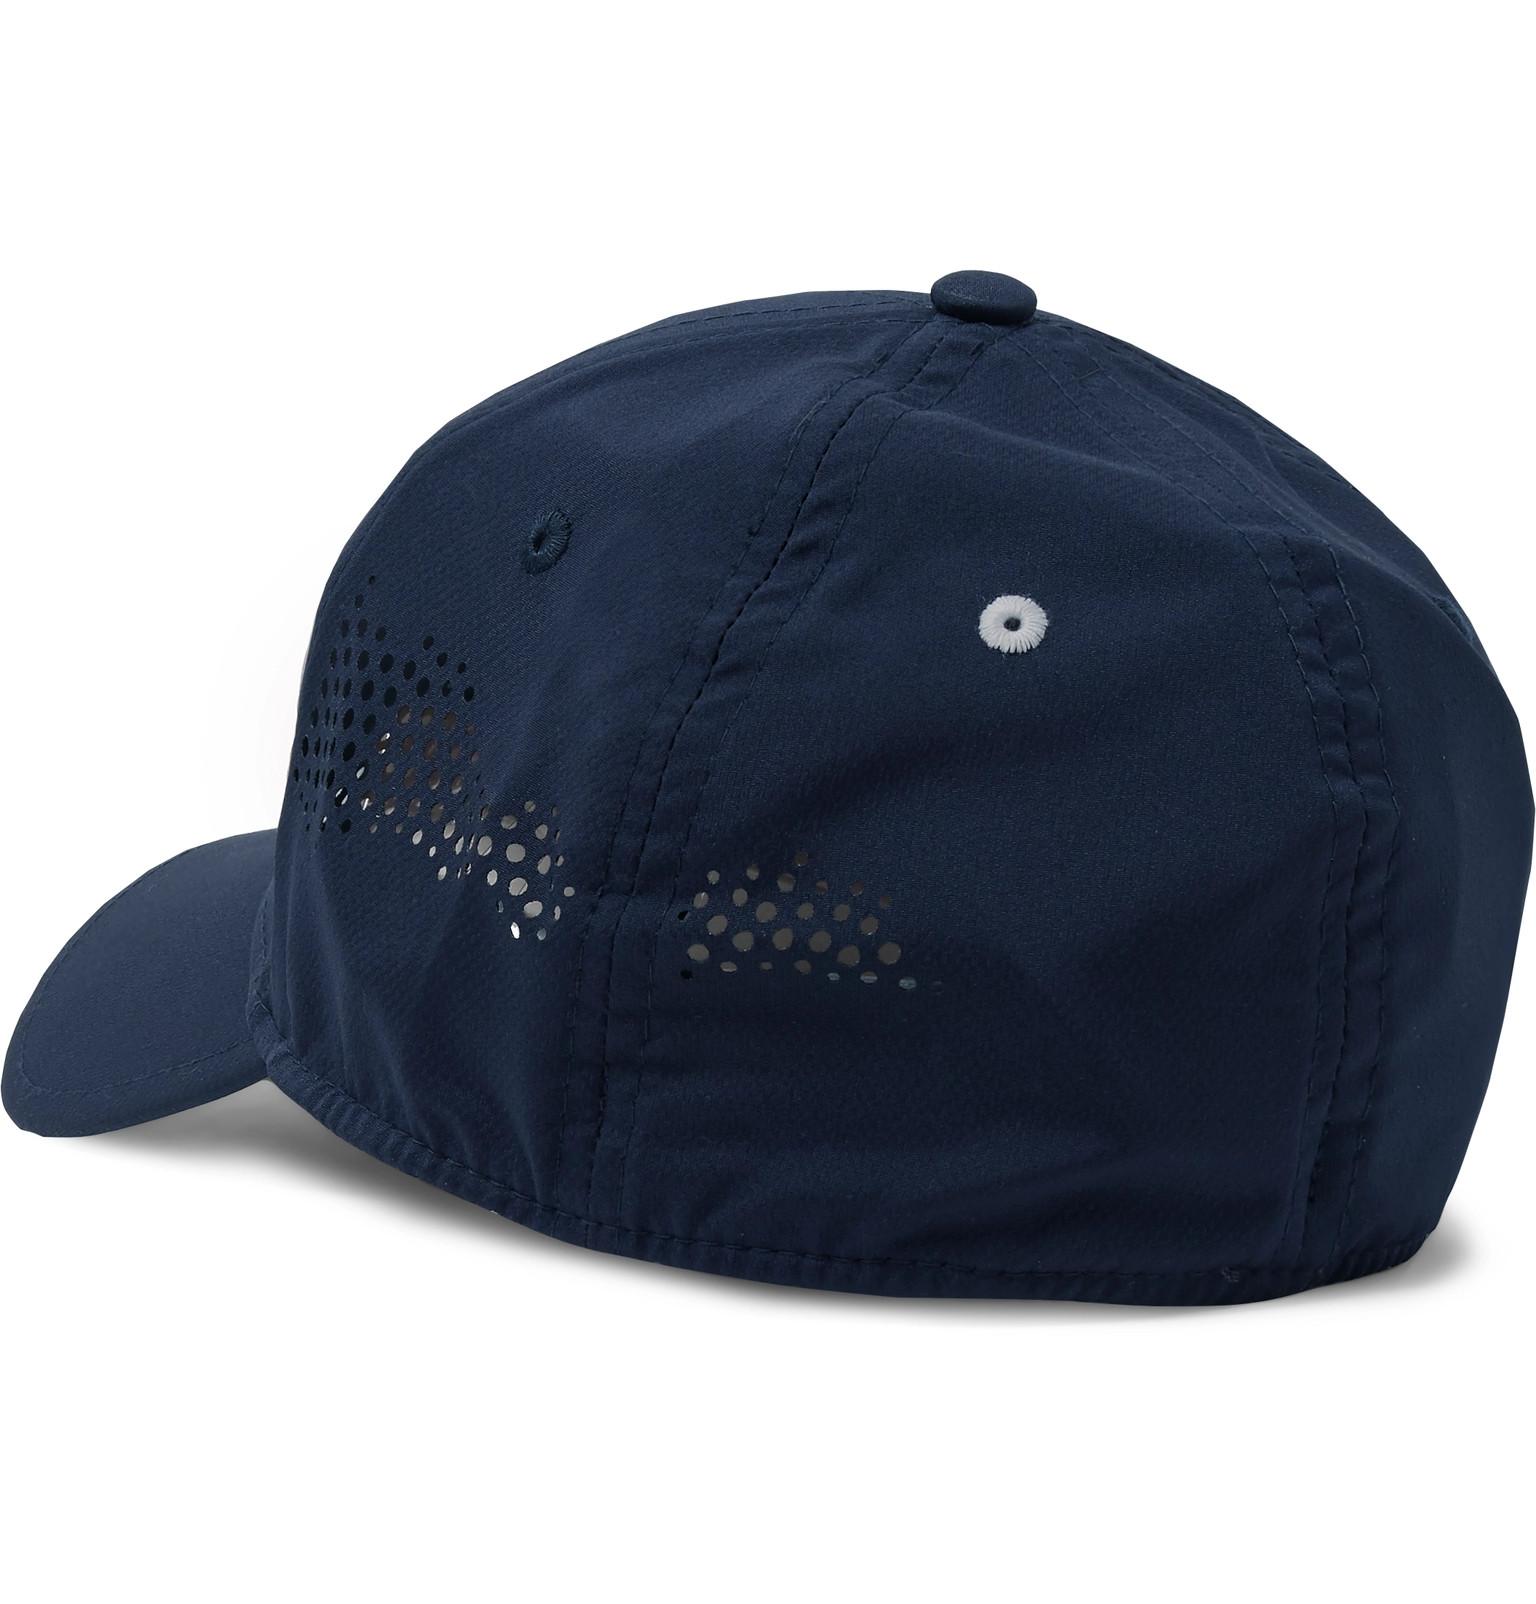 Kjus Golf - Captain Lazer Logo-Appliquéd Woven Cap ceae9eddb3e